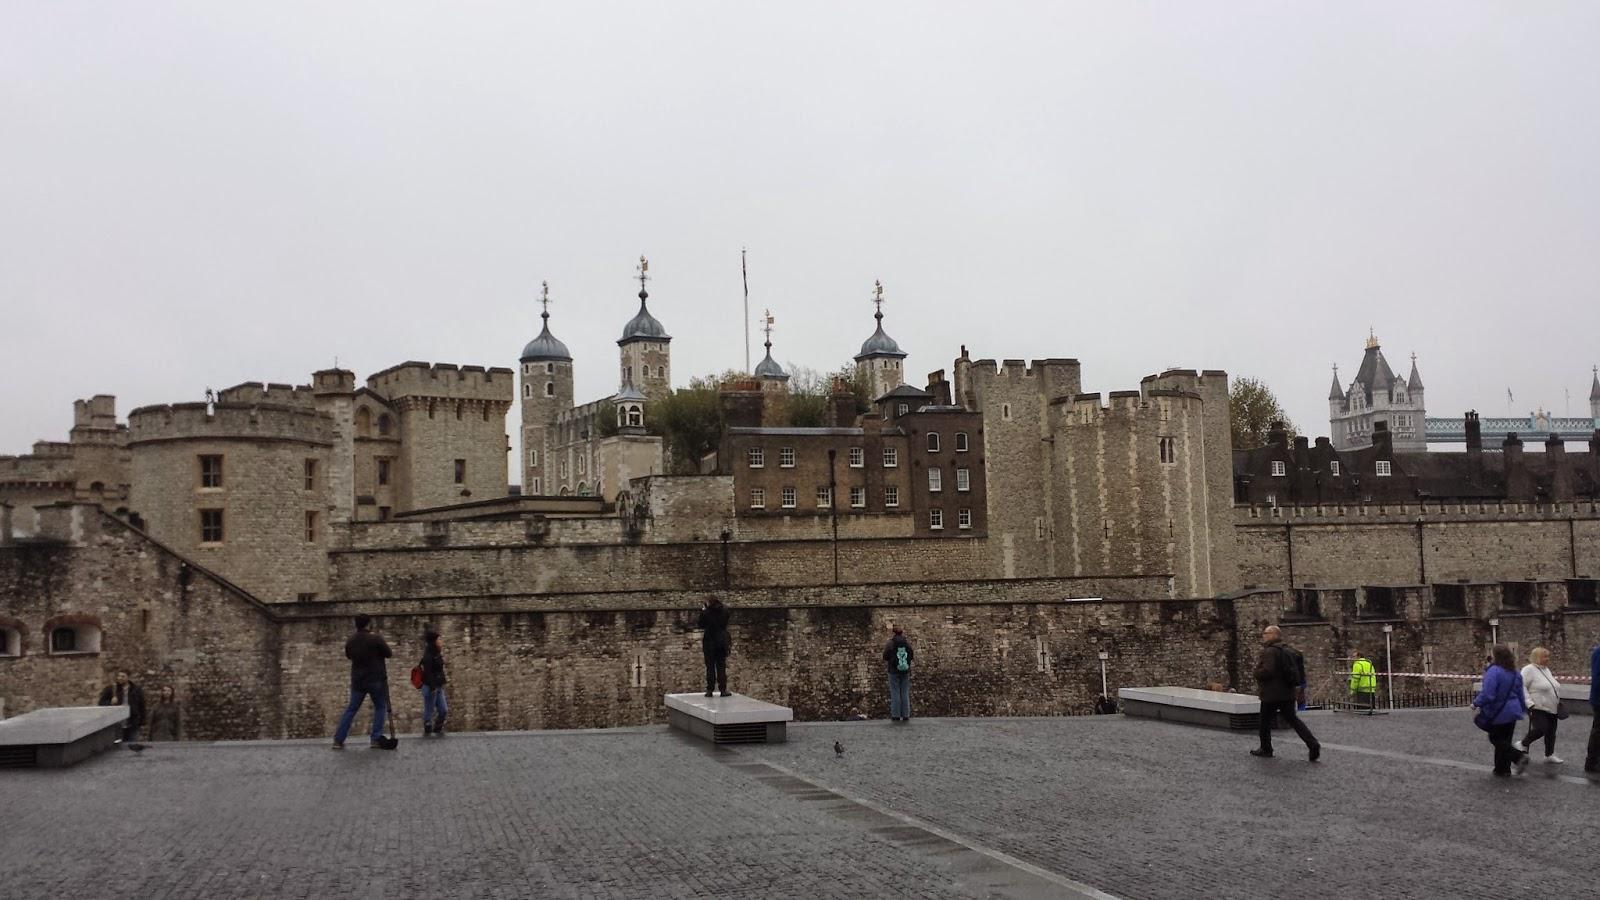 Tower of London - Honeymoon